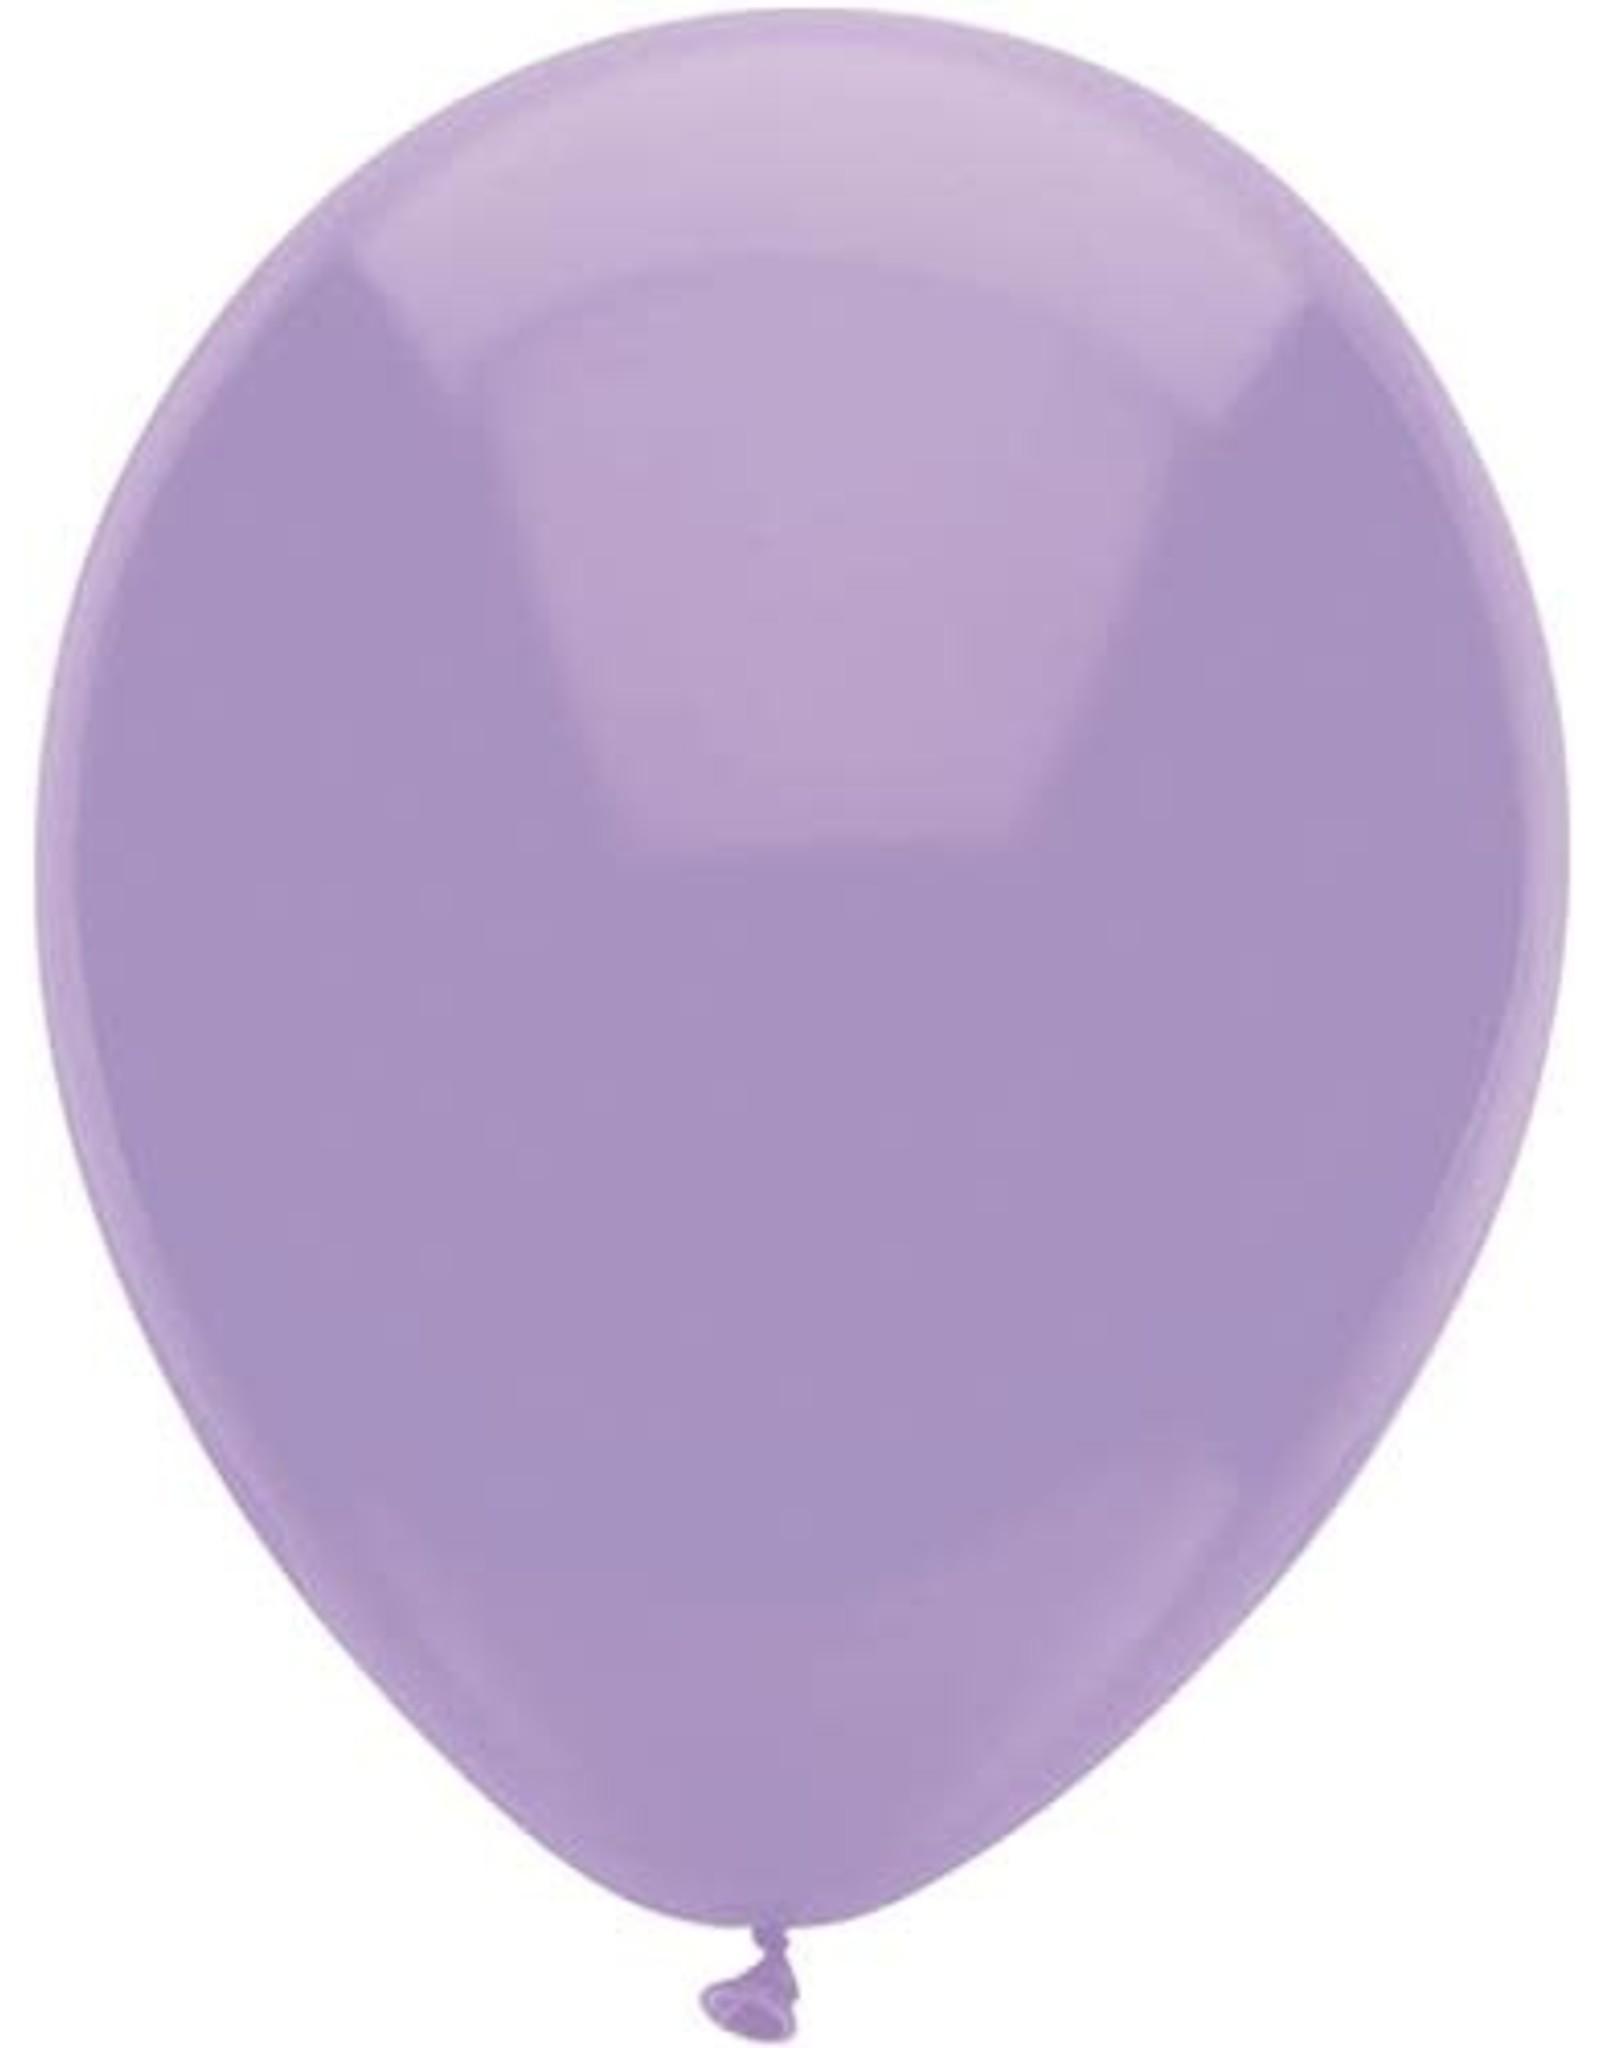 Ballonnen Uni Lila (30 cm, 100 stuks)